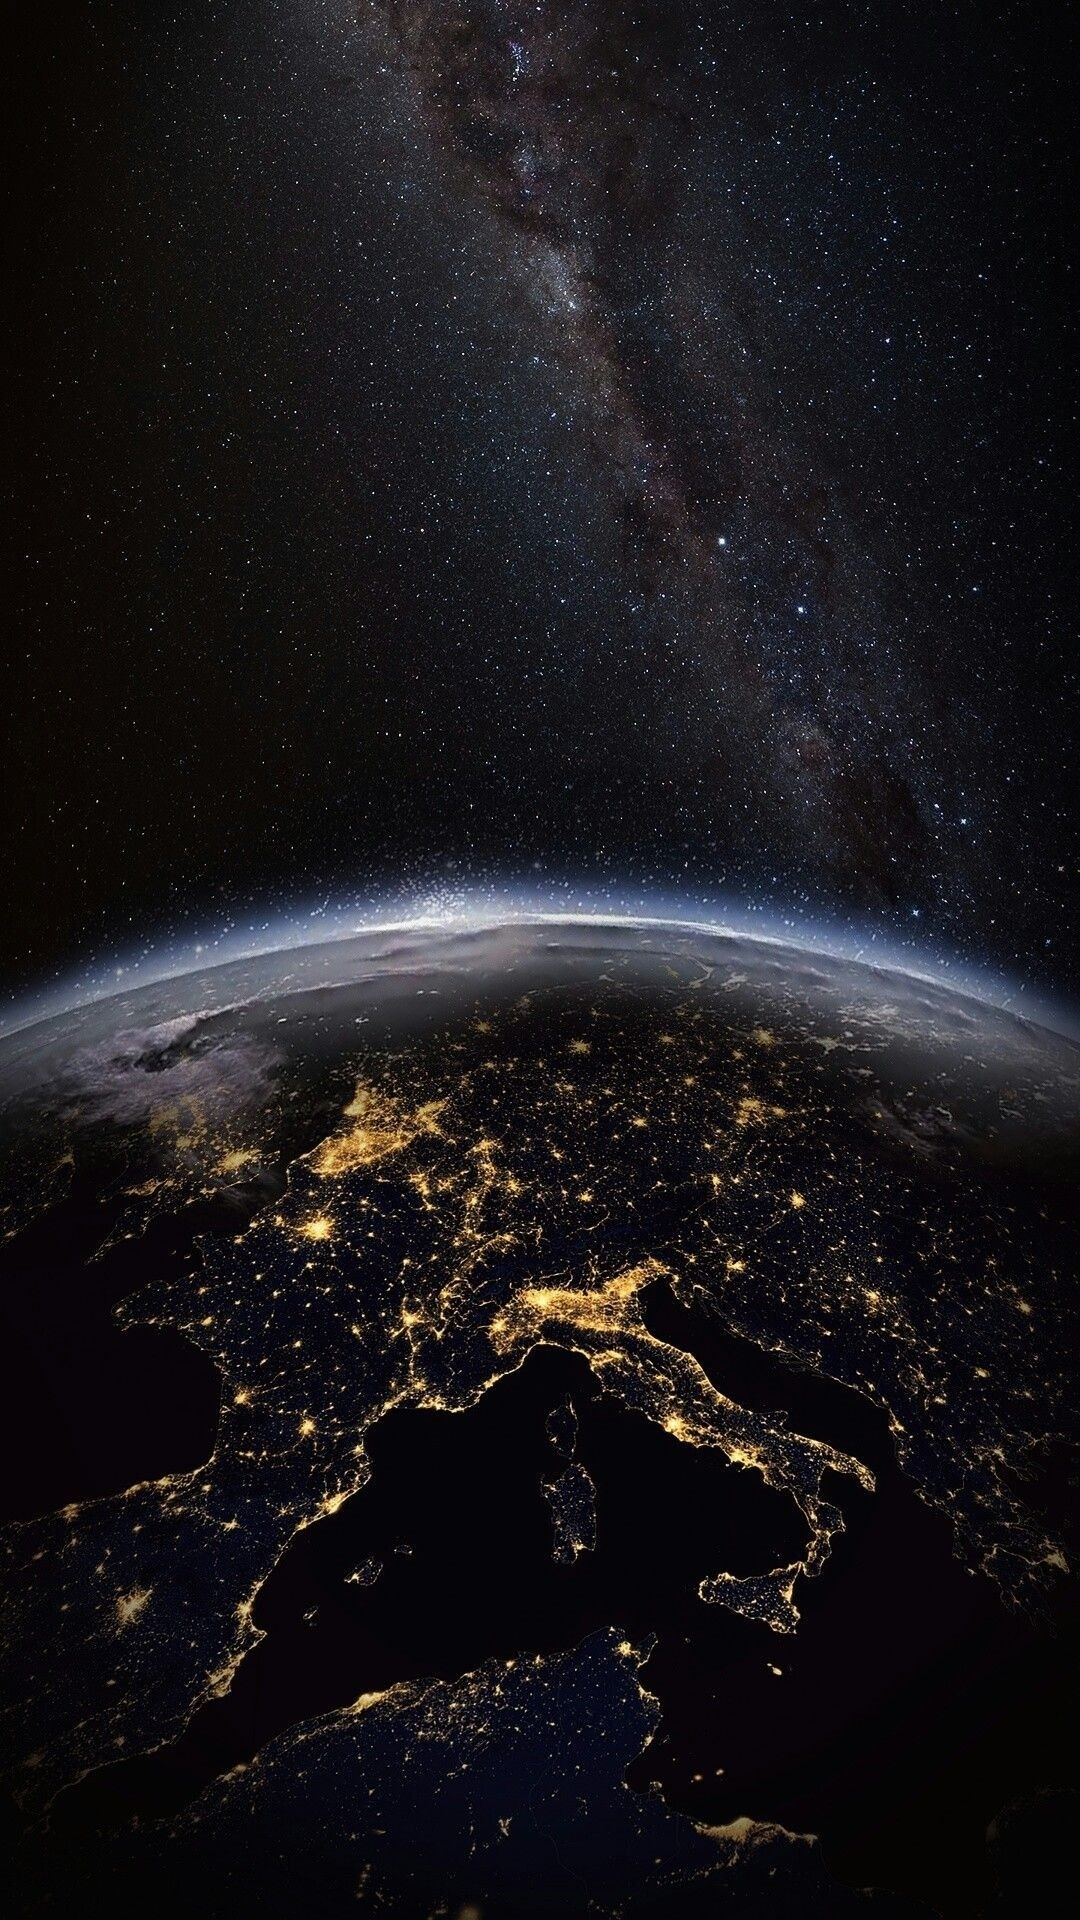 Earth iPhone hd wallpaper